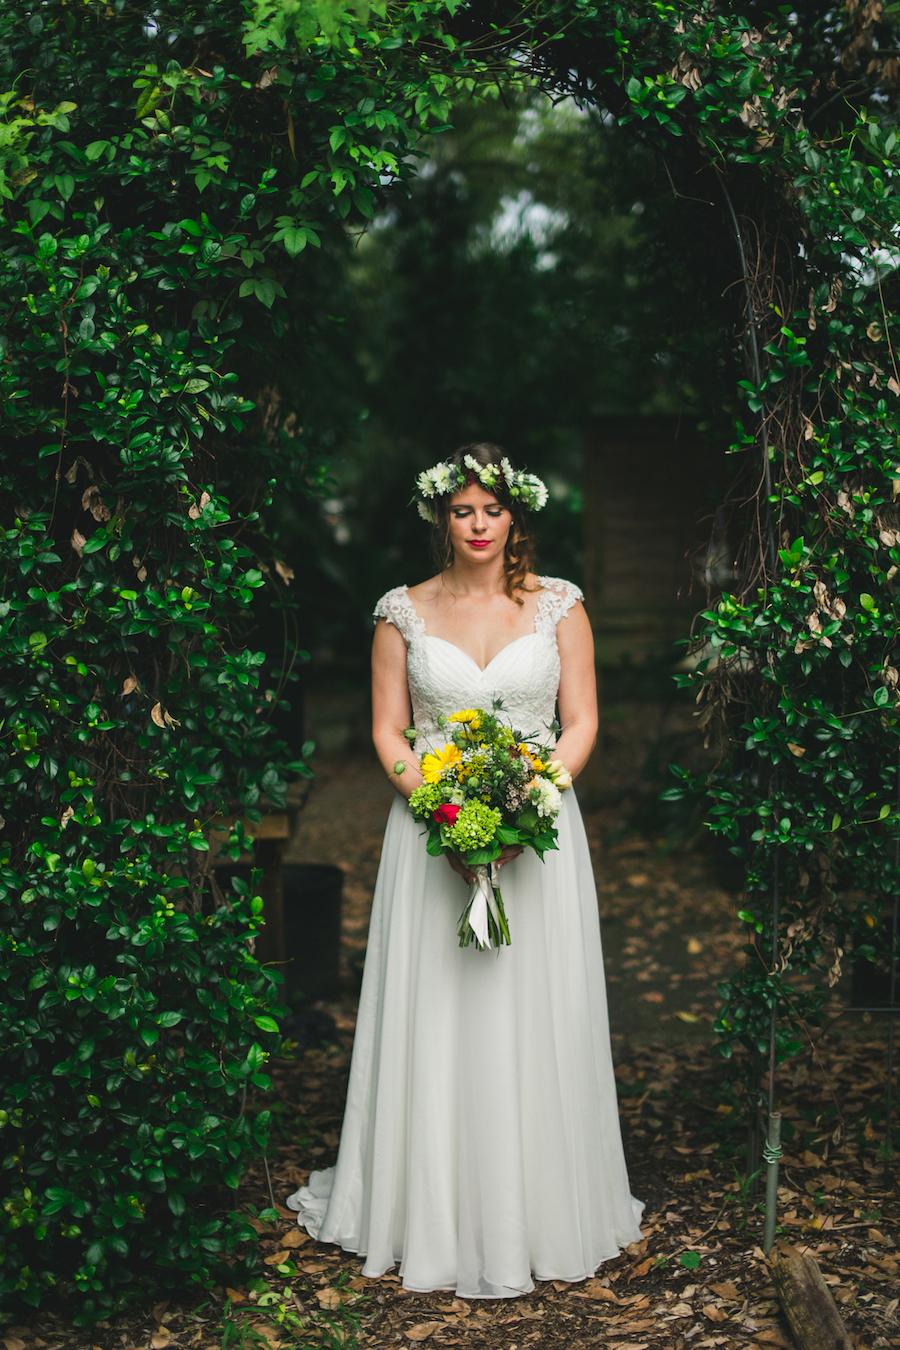 Boho Garden Bride Portrait   Best St. Pete Wedding Photographer   Roohi Photography